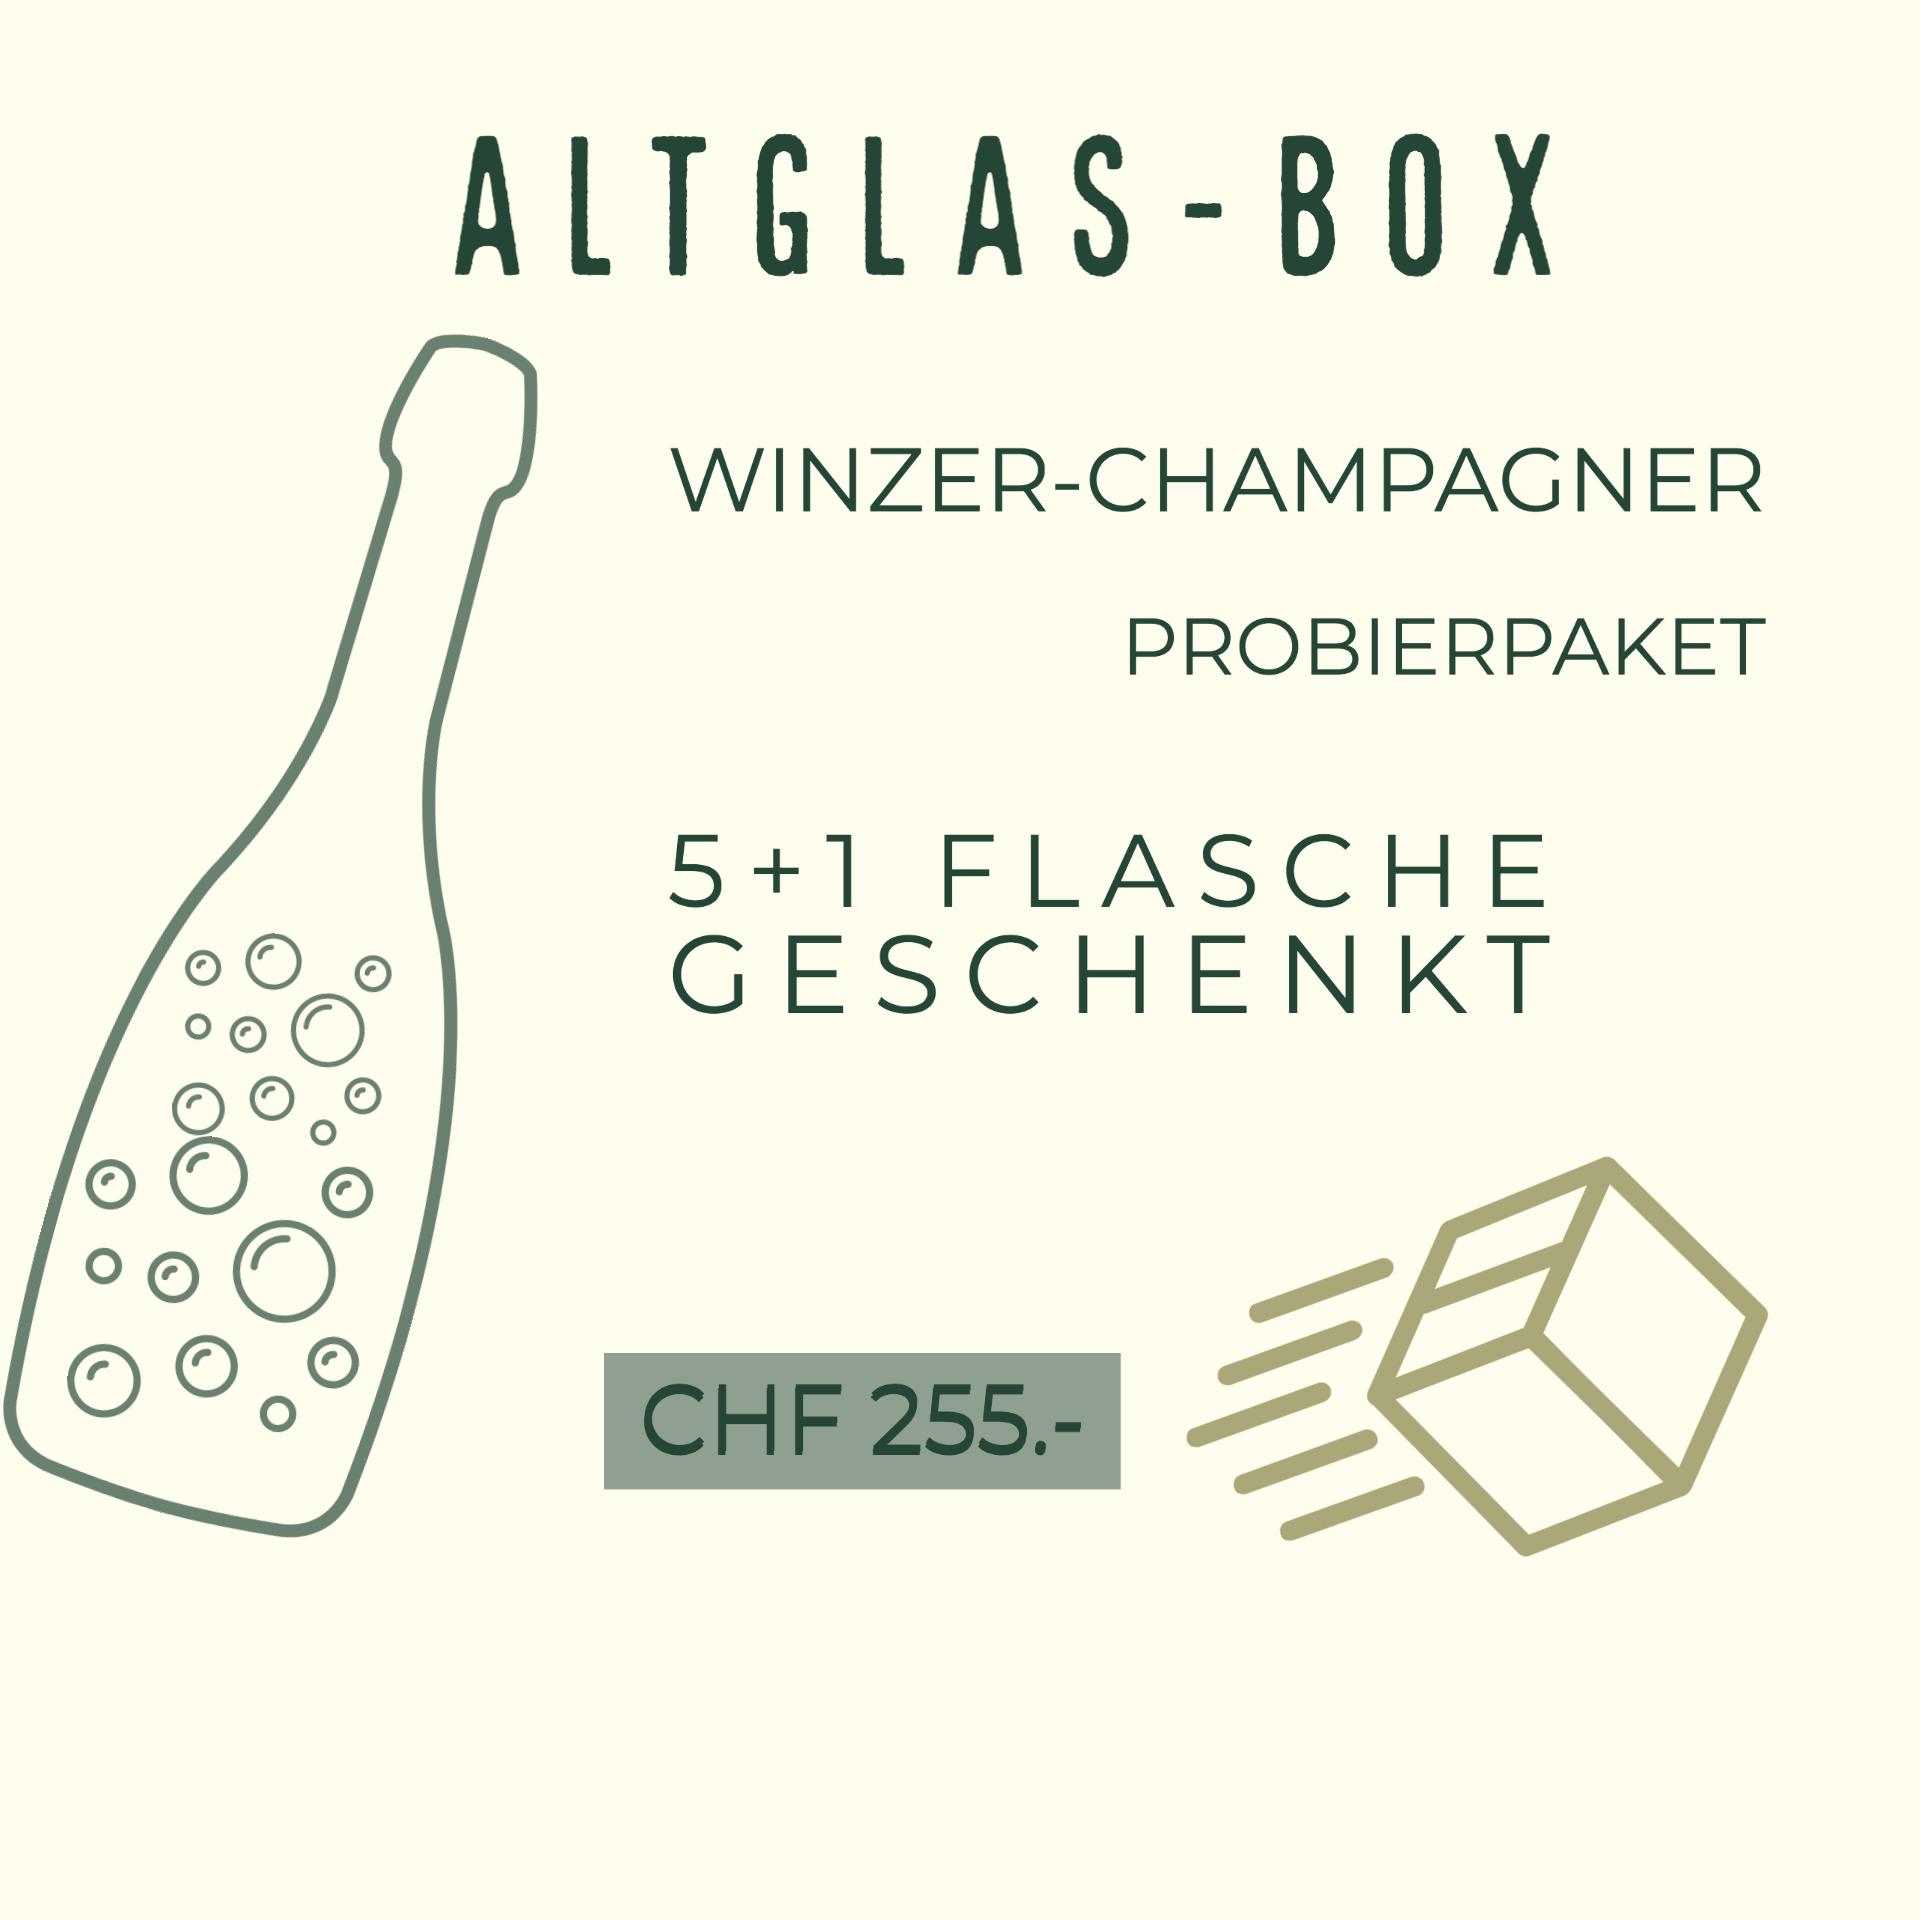 Altglas Box